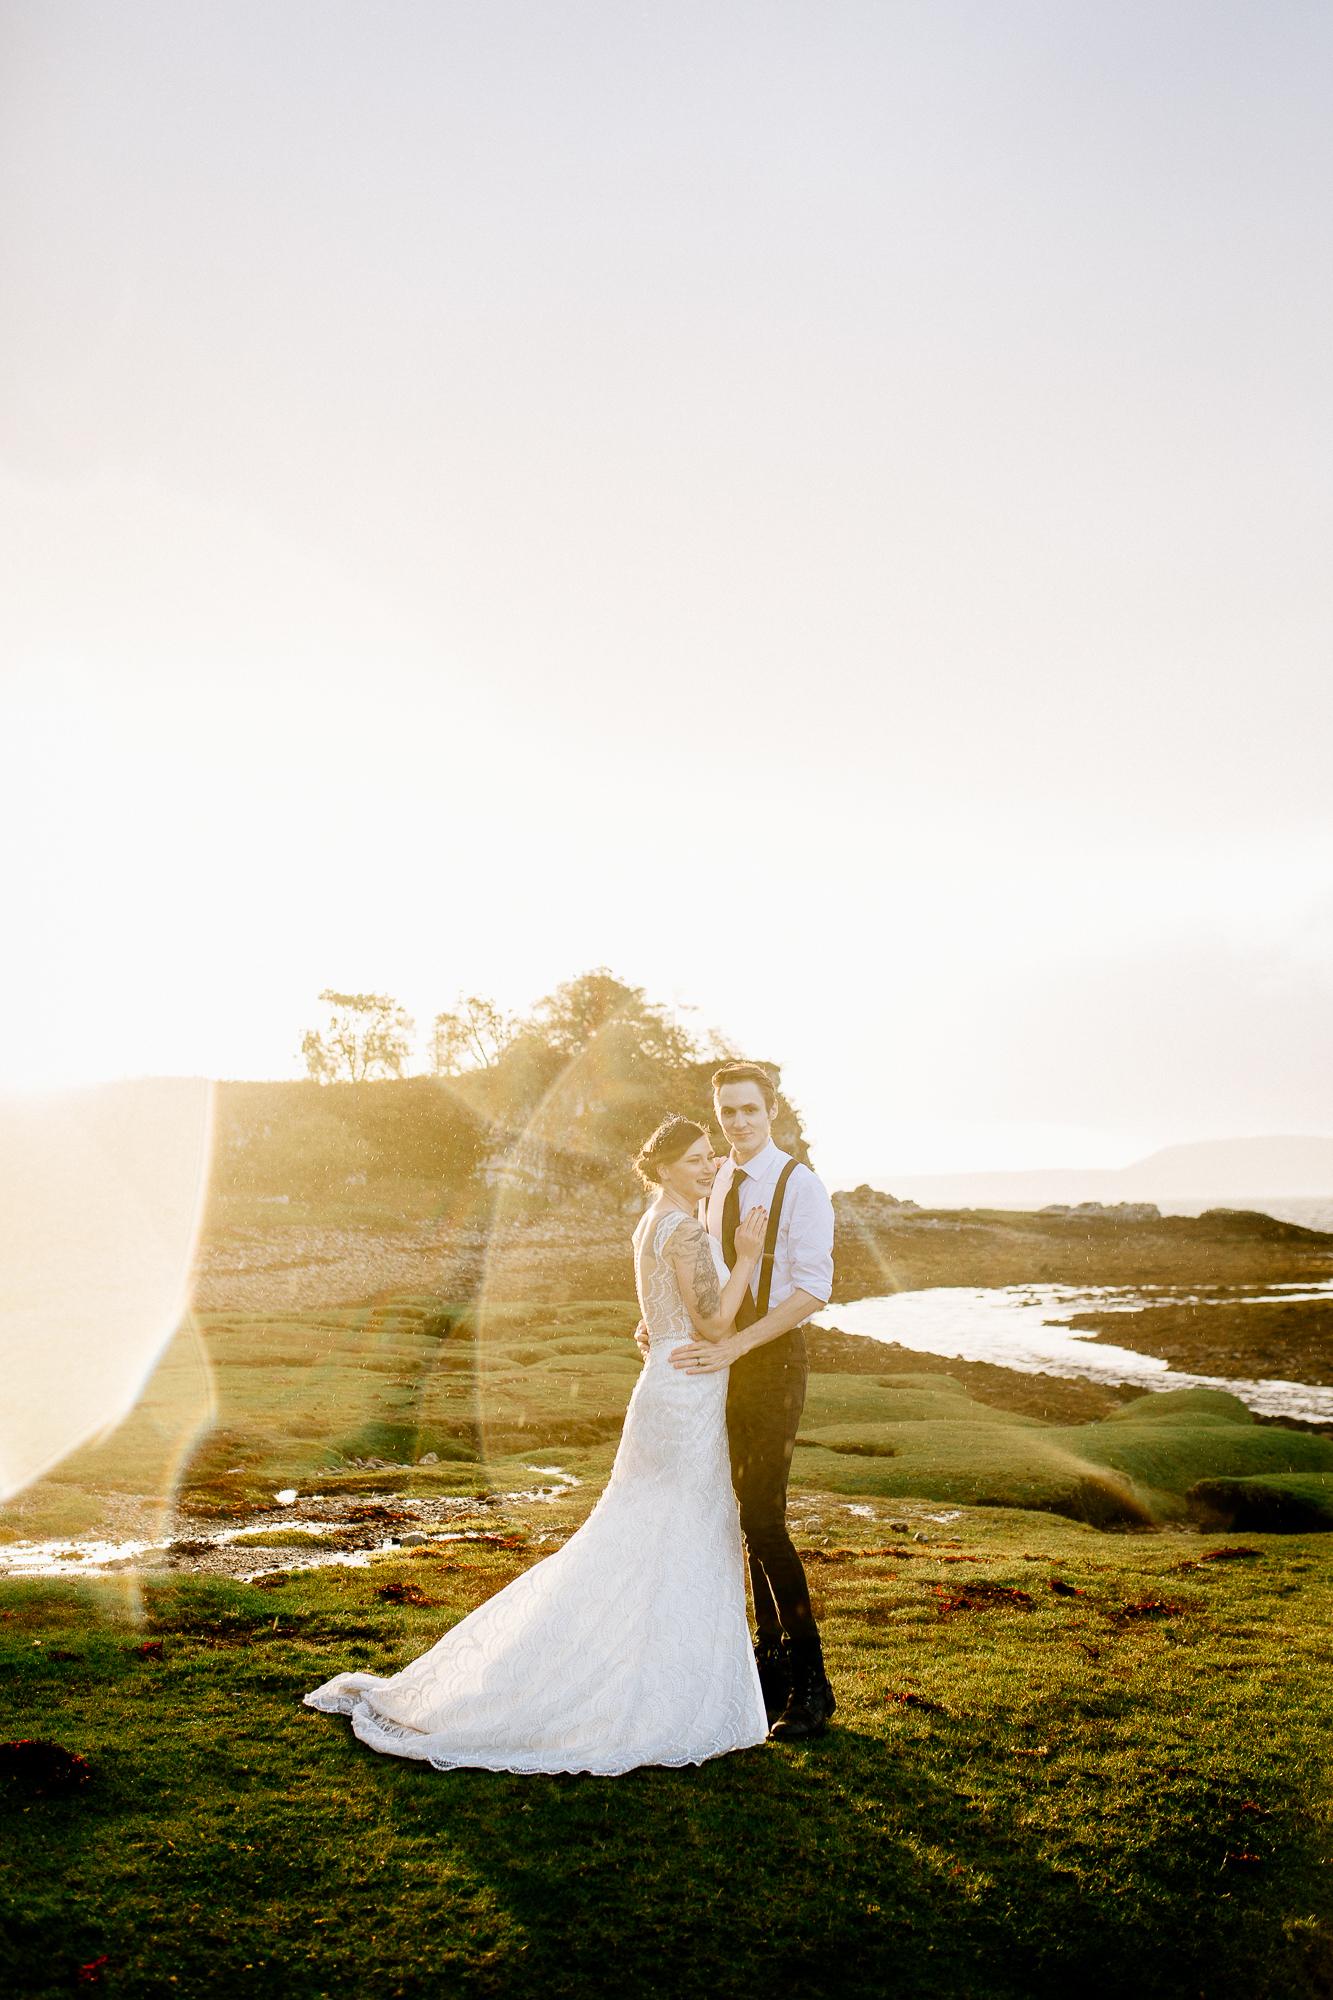 Jen_Montgomery_Photography_Scotland_Wedding_CorrieWill_FB-716.jpg